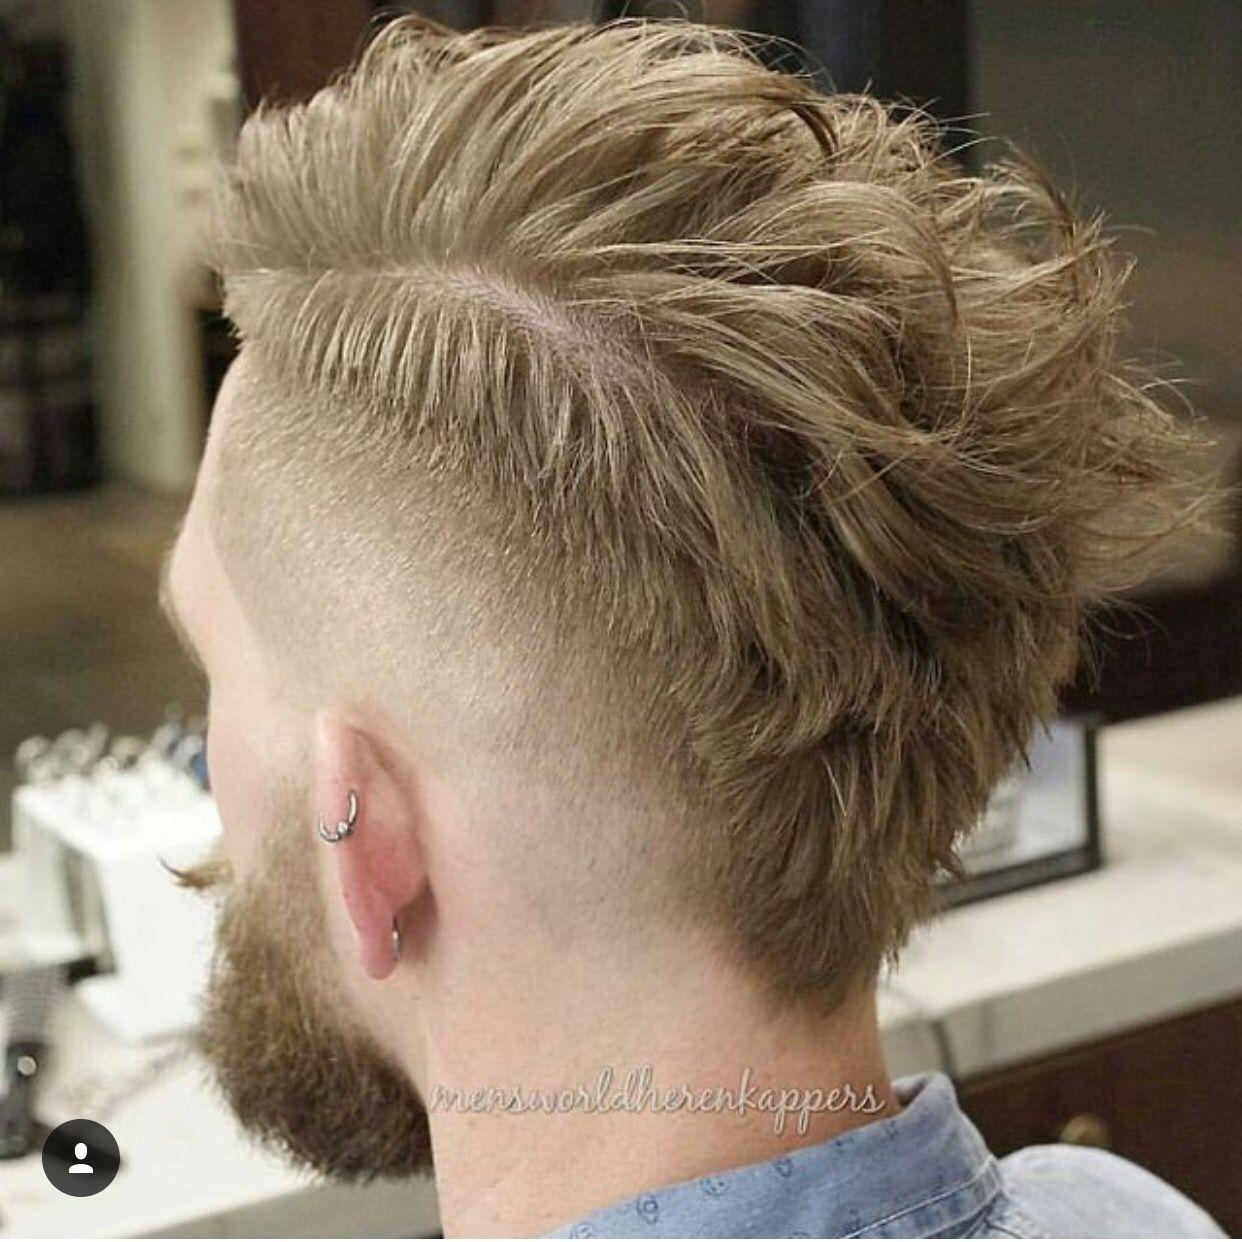 11 Peinado mohicano